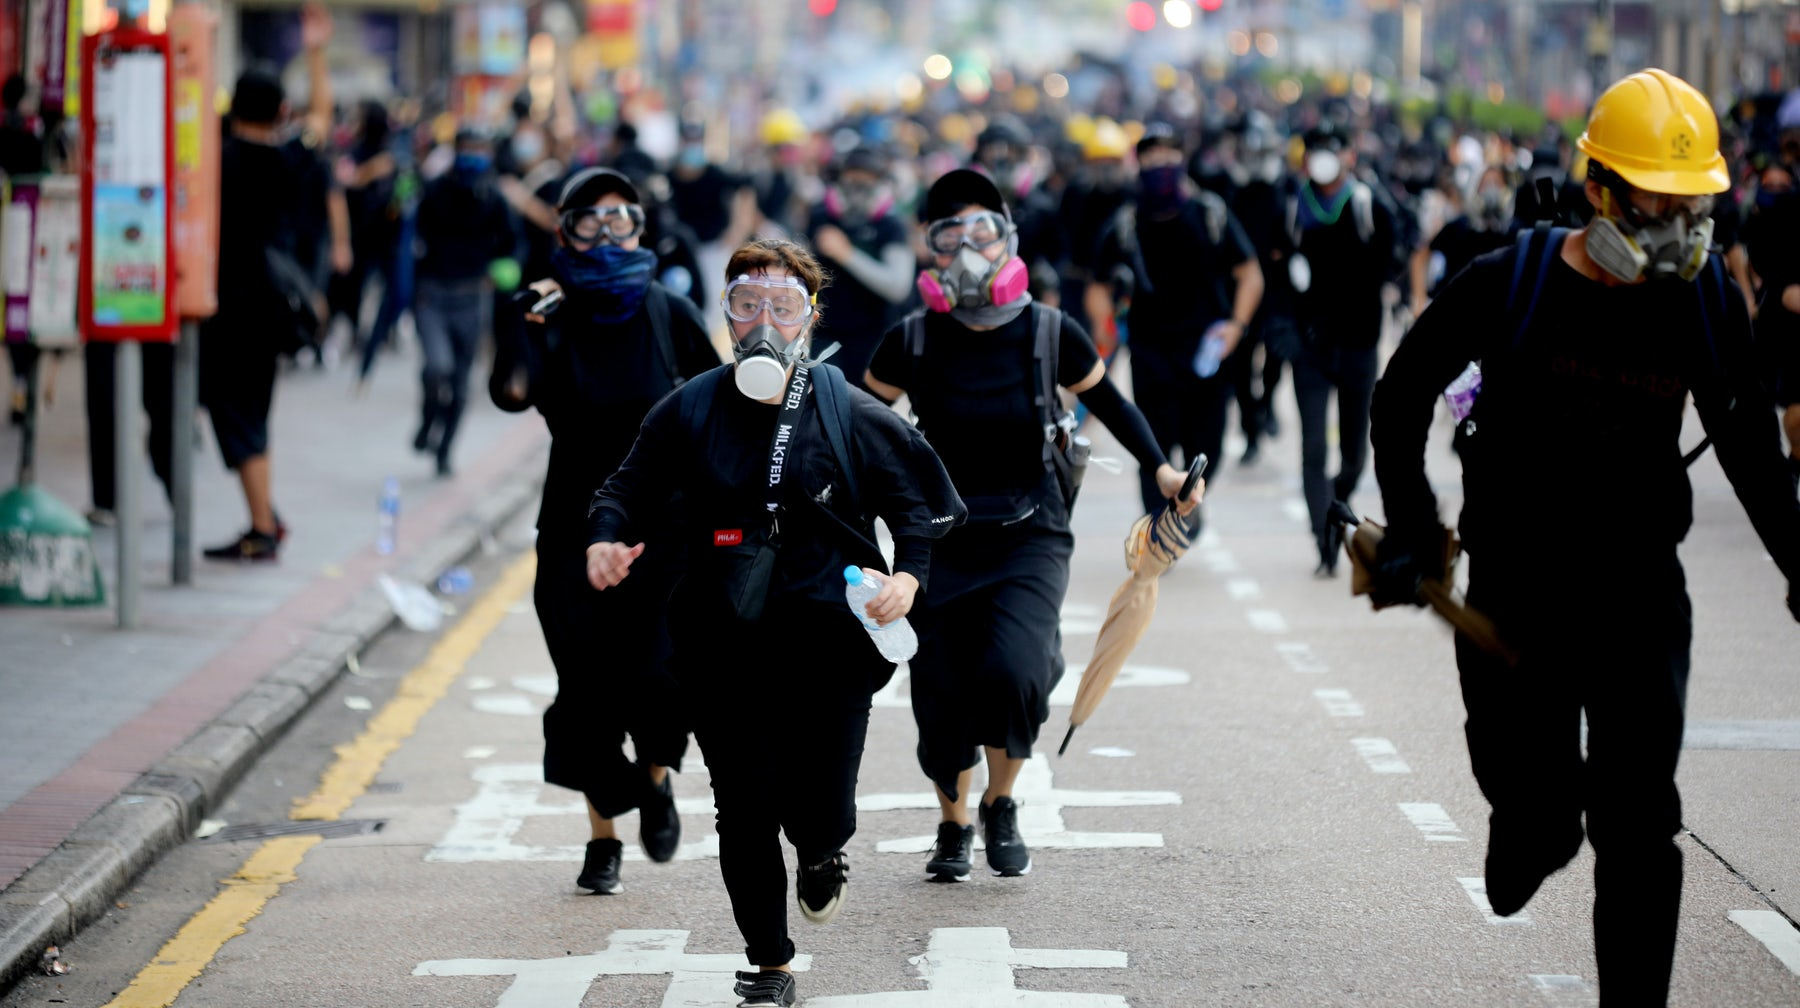 Protestors in Hong Kong on October 1, 2019   Source: Shutterstock